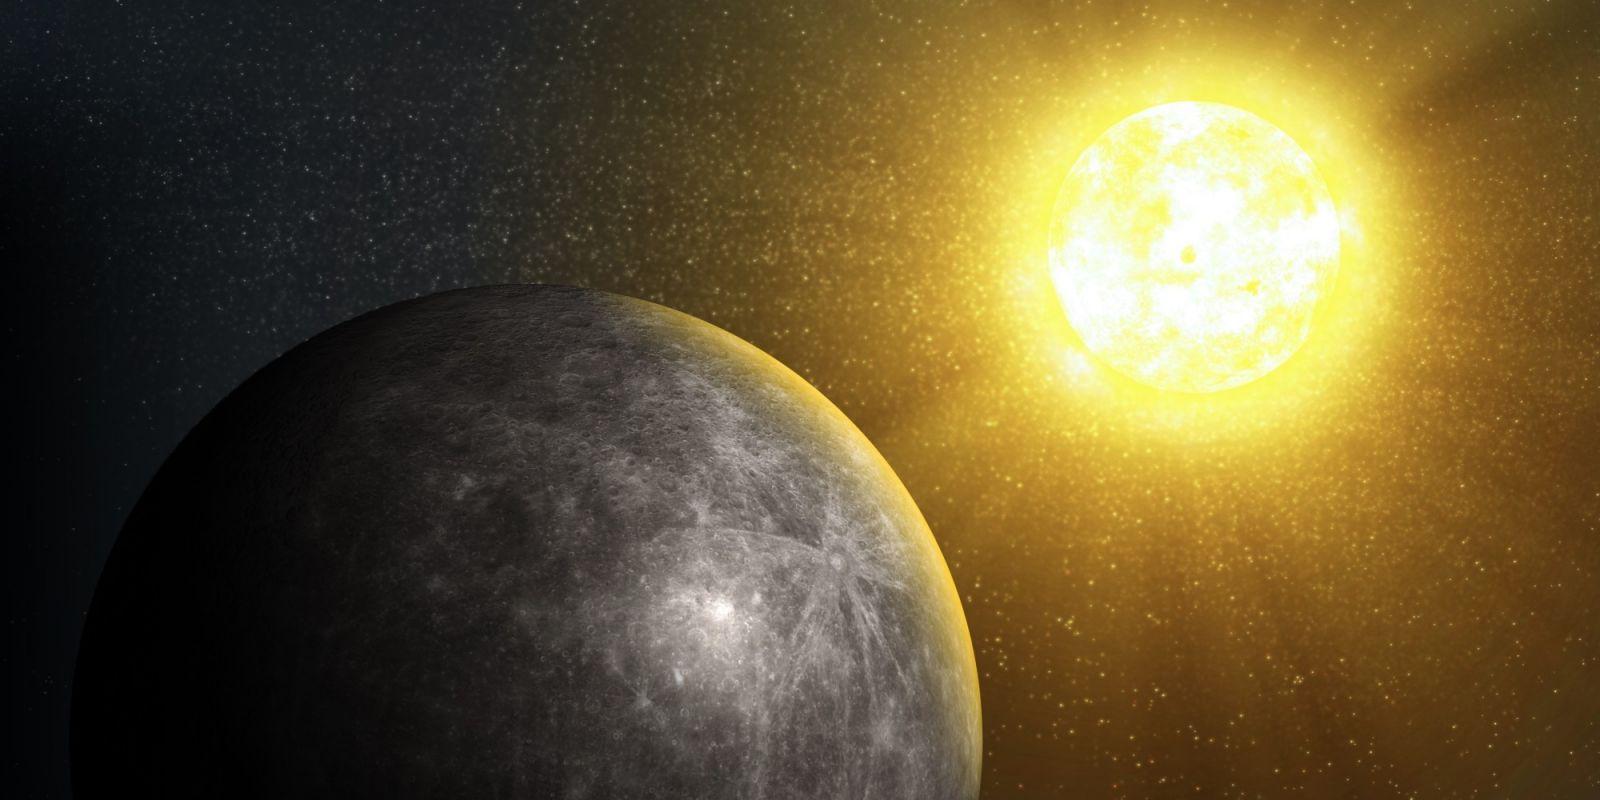 Меркурий самая близкая планета от Солнца